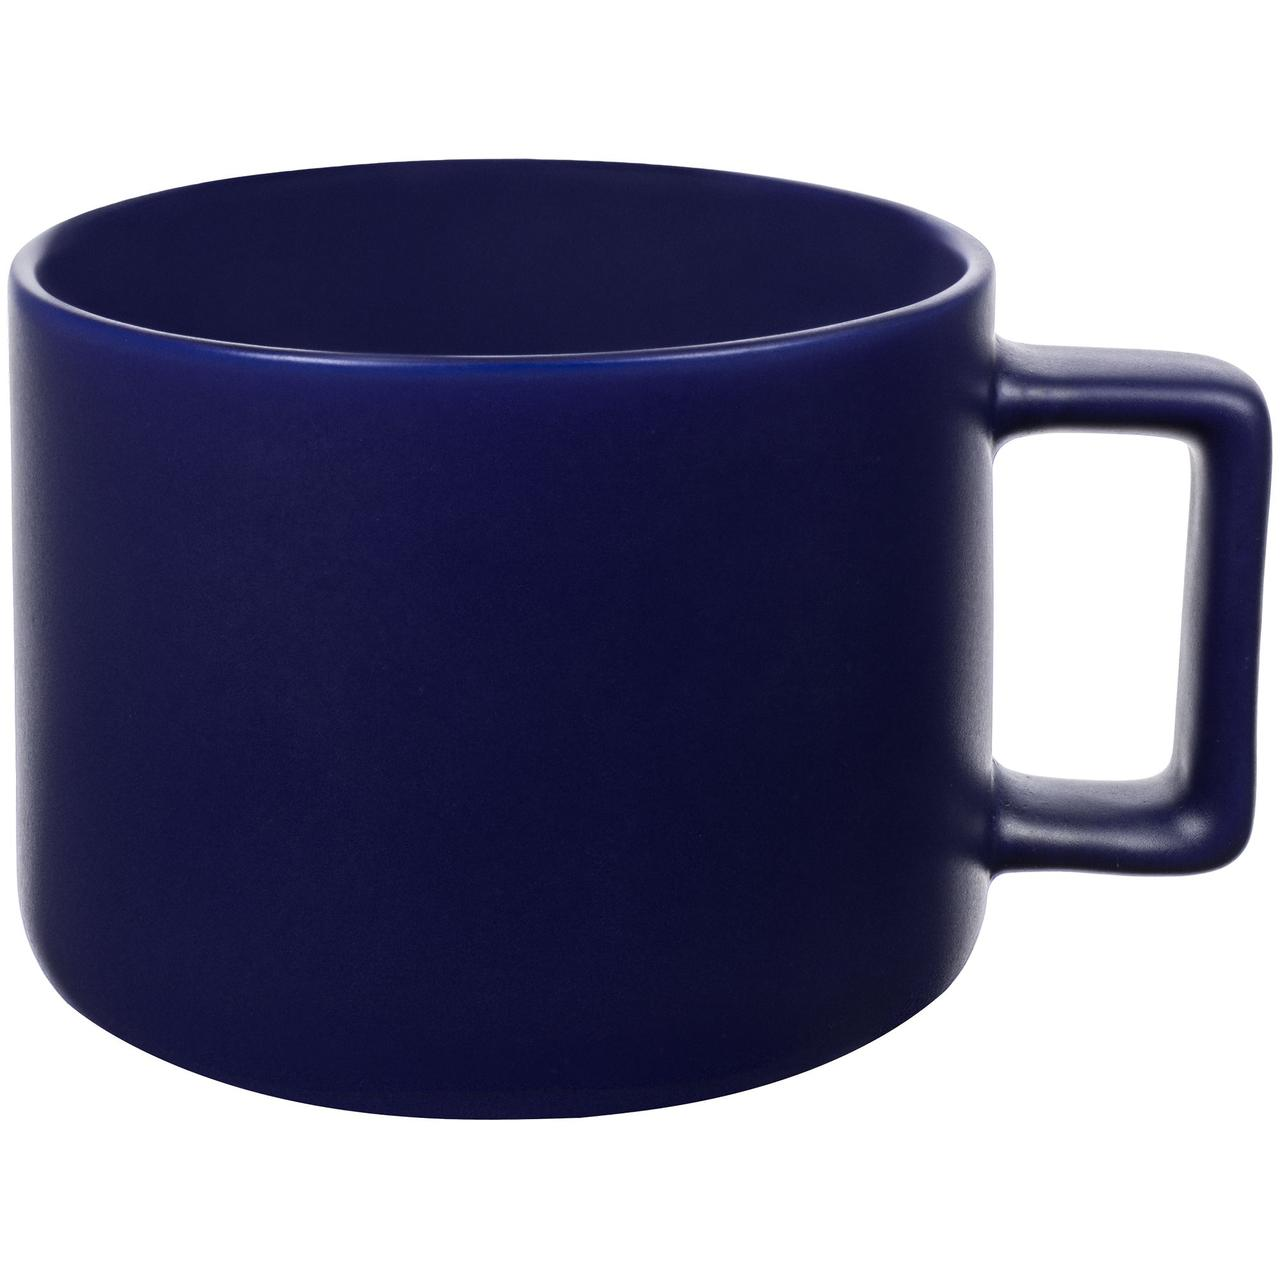 Чашка Jumbo, матовая, синяя (артикул 12917.40)